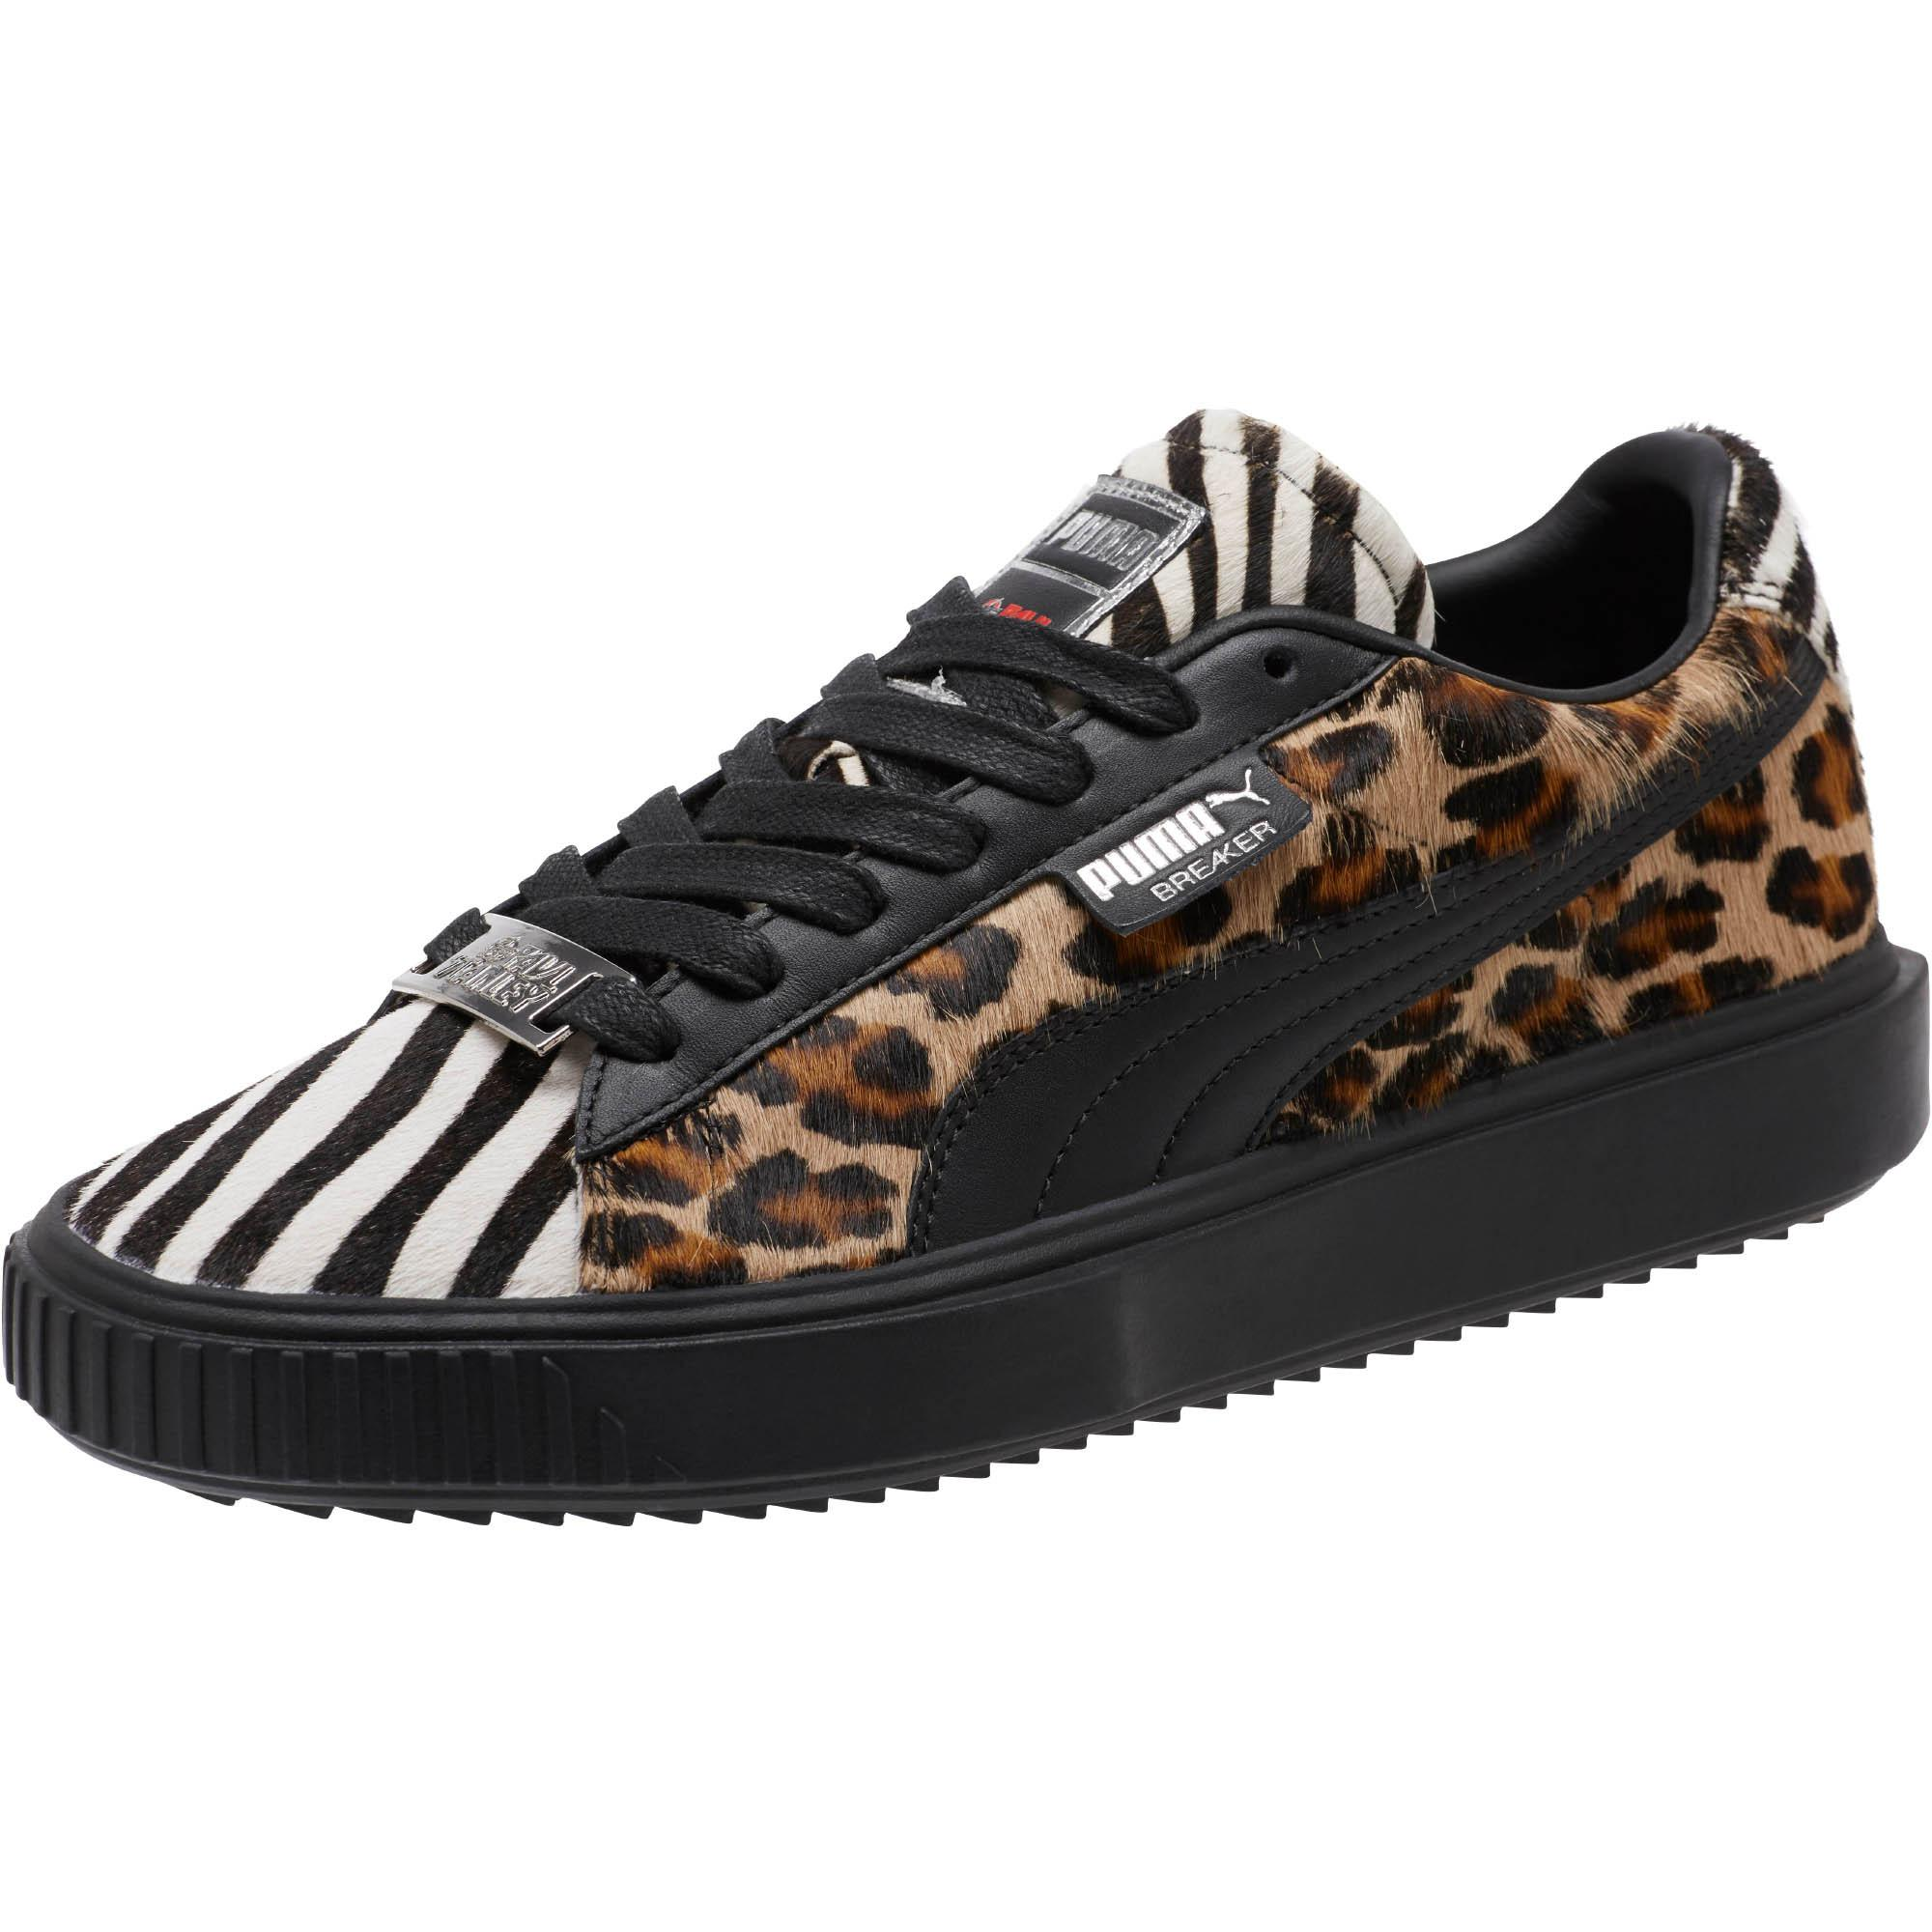 superior quality 9b653 55757 Black X Paul Stanley Breaker Men's Sneakers